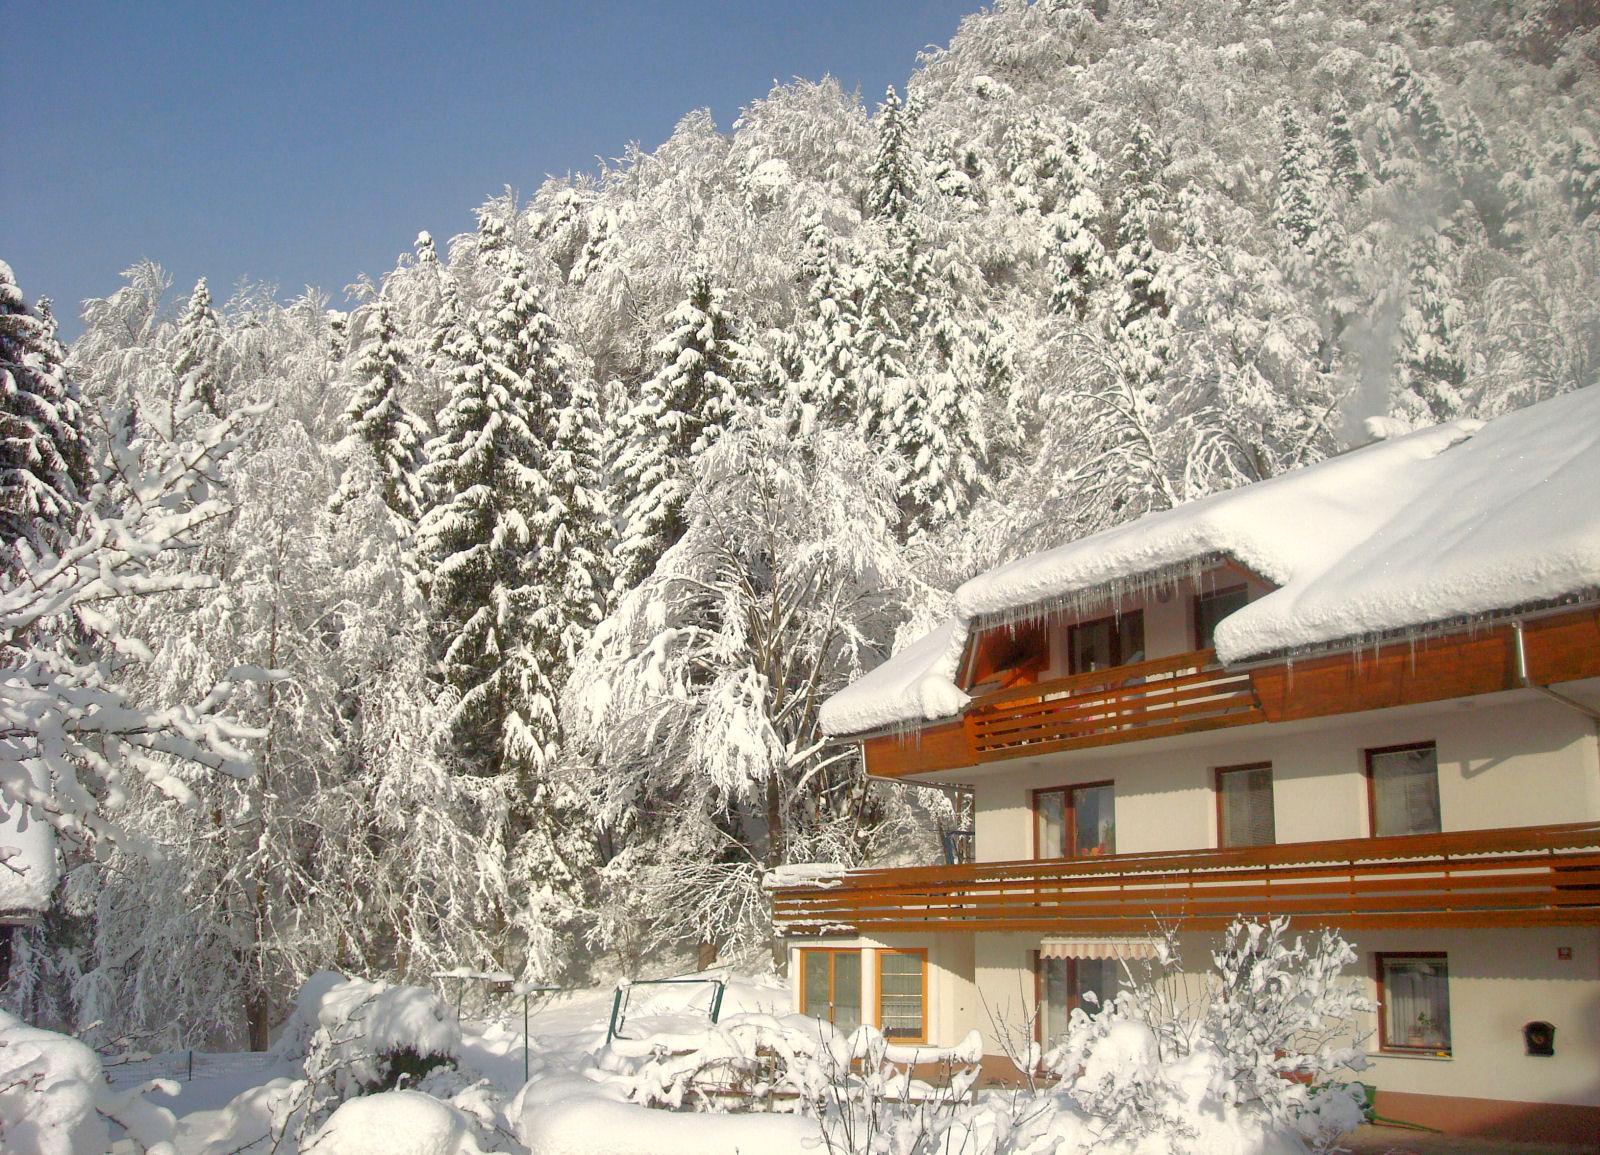 Slovenia has plenty of snow